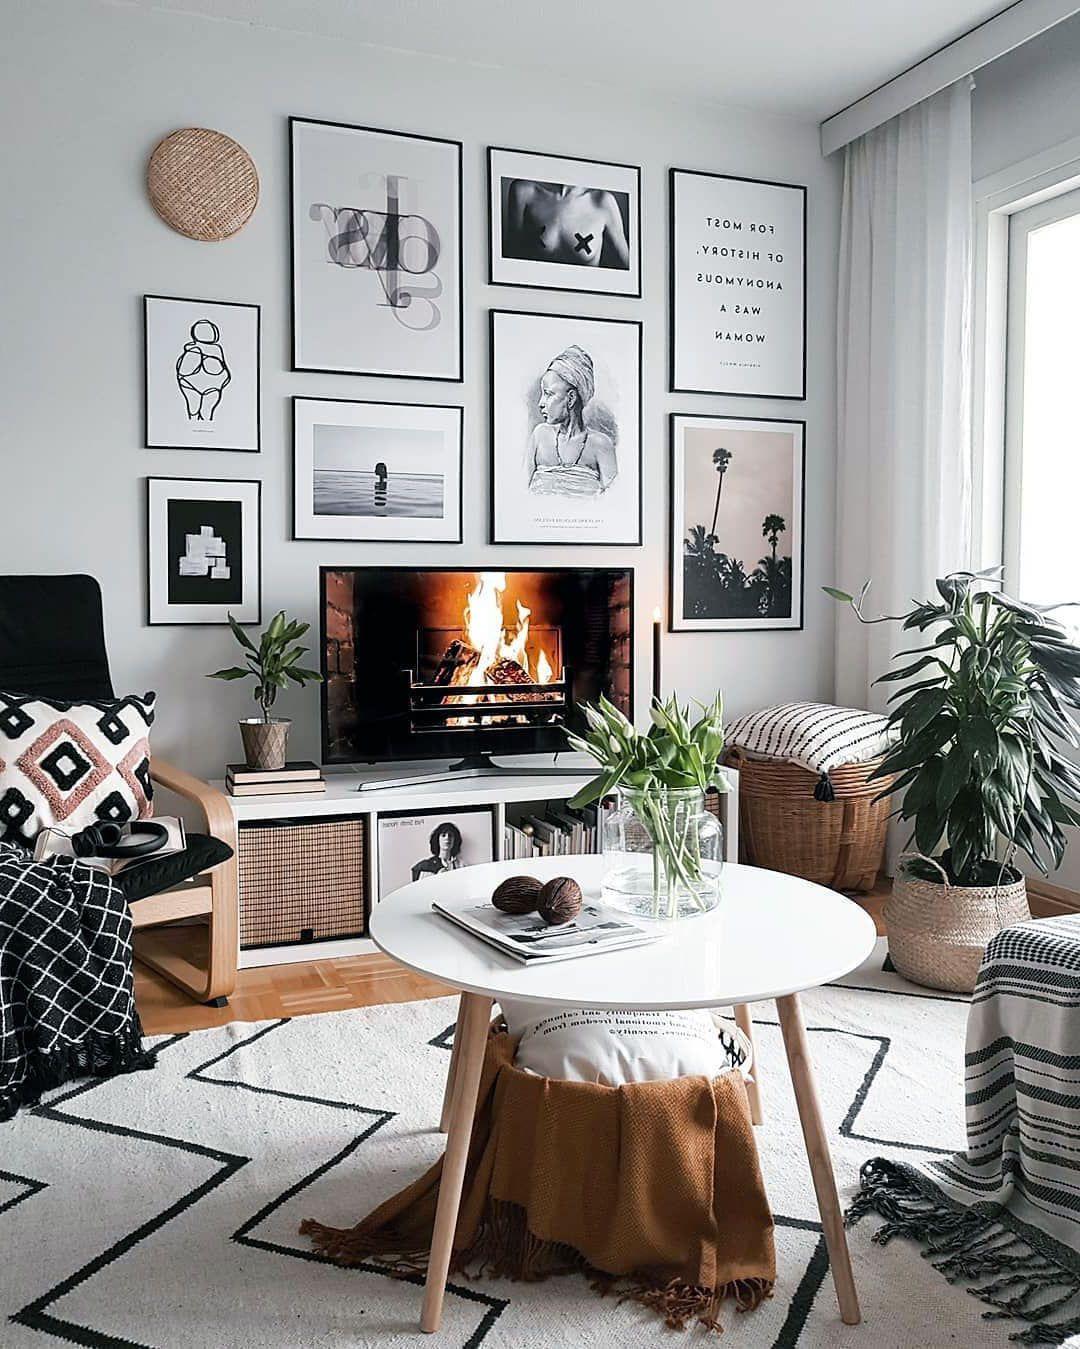 28 Marvelous Scandinavian Living Rooms With Boho Style Ideas Living Room Scandinavian Boho Scandinavian Living Room Scandanavian Interiors Living Room